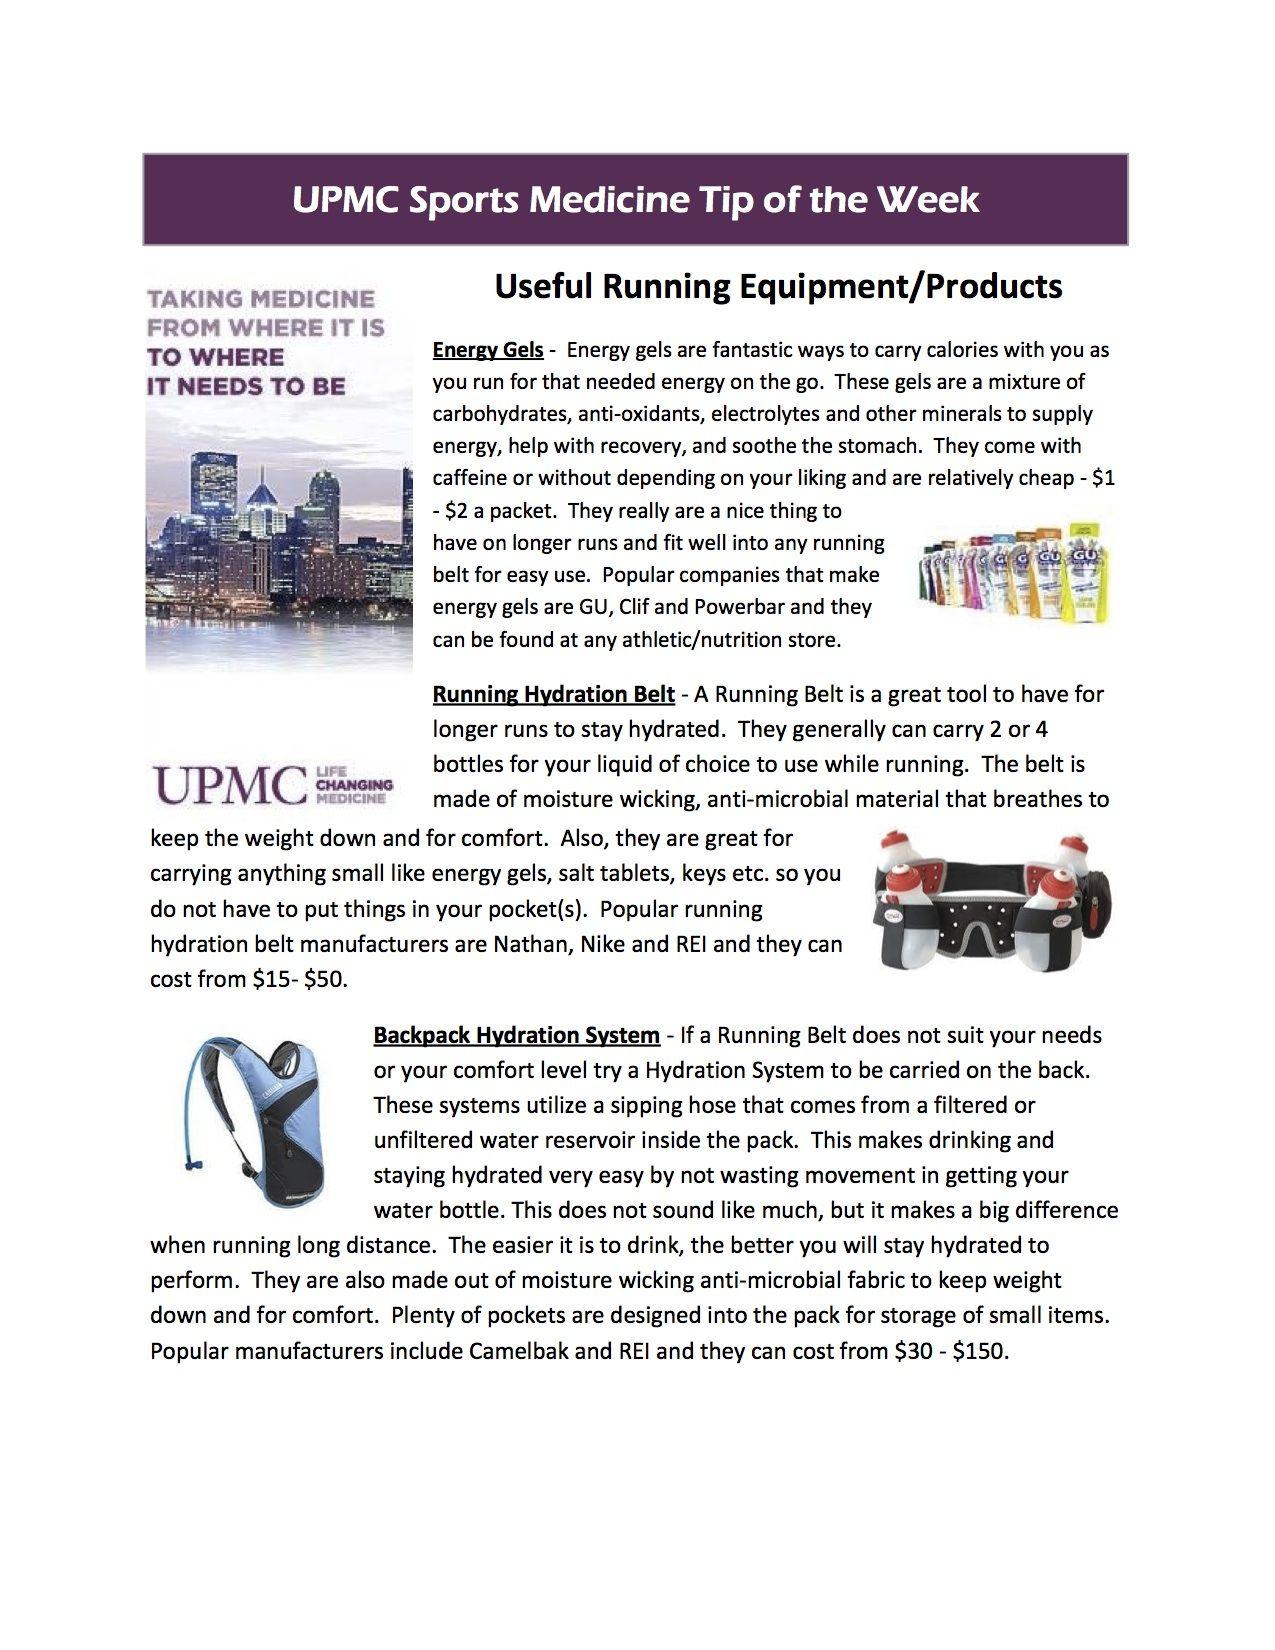 10 Upmc Sports Medicine And Hospitals Ideas Sports Medicine Medicine Sports